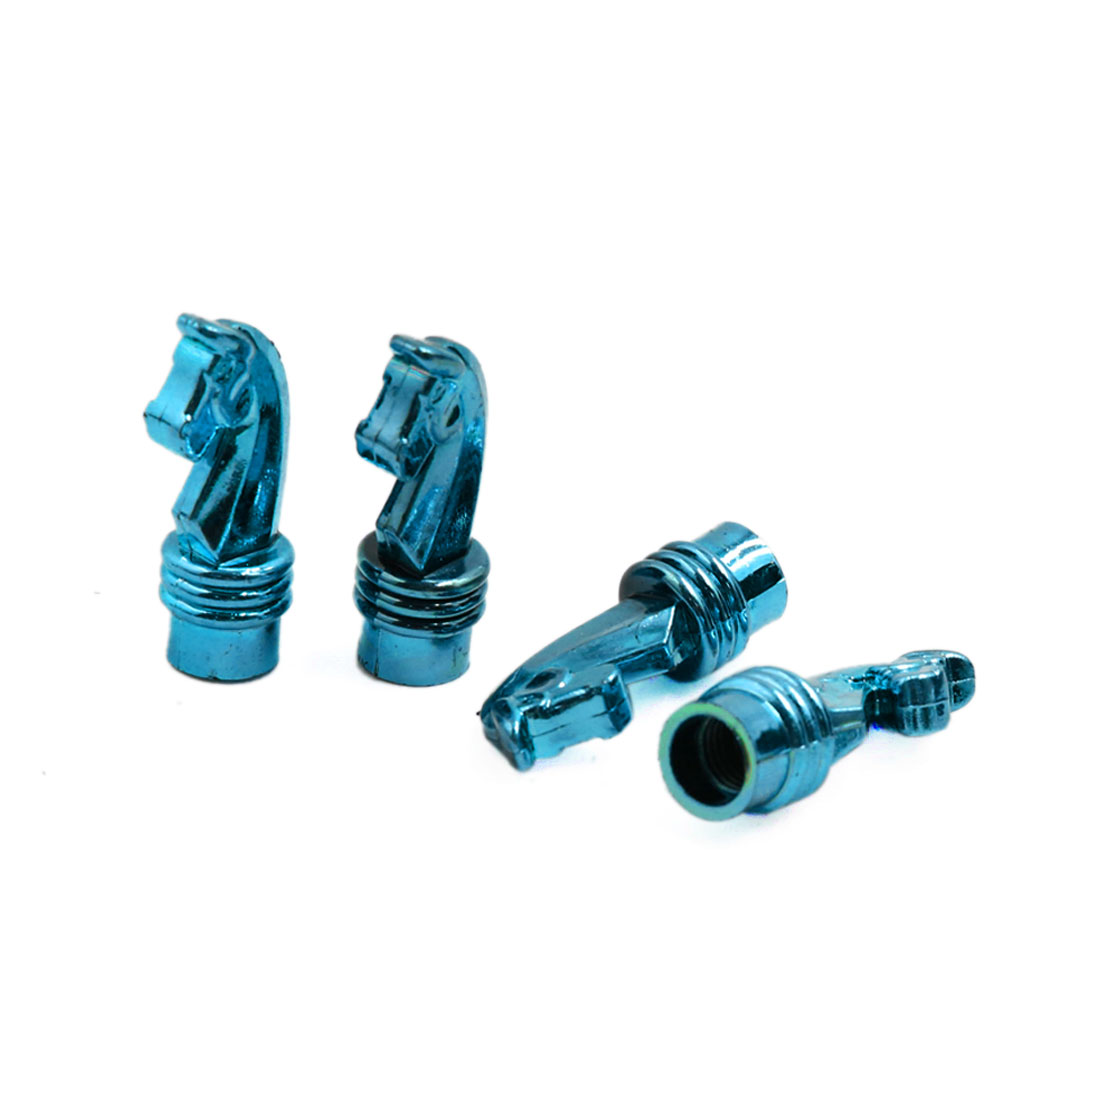 4 Pcs Blue Car Sea Horse Head Shape Tire Tyre Valve Air Caps Covers